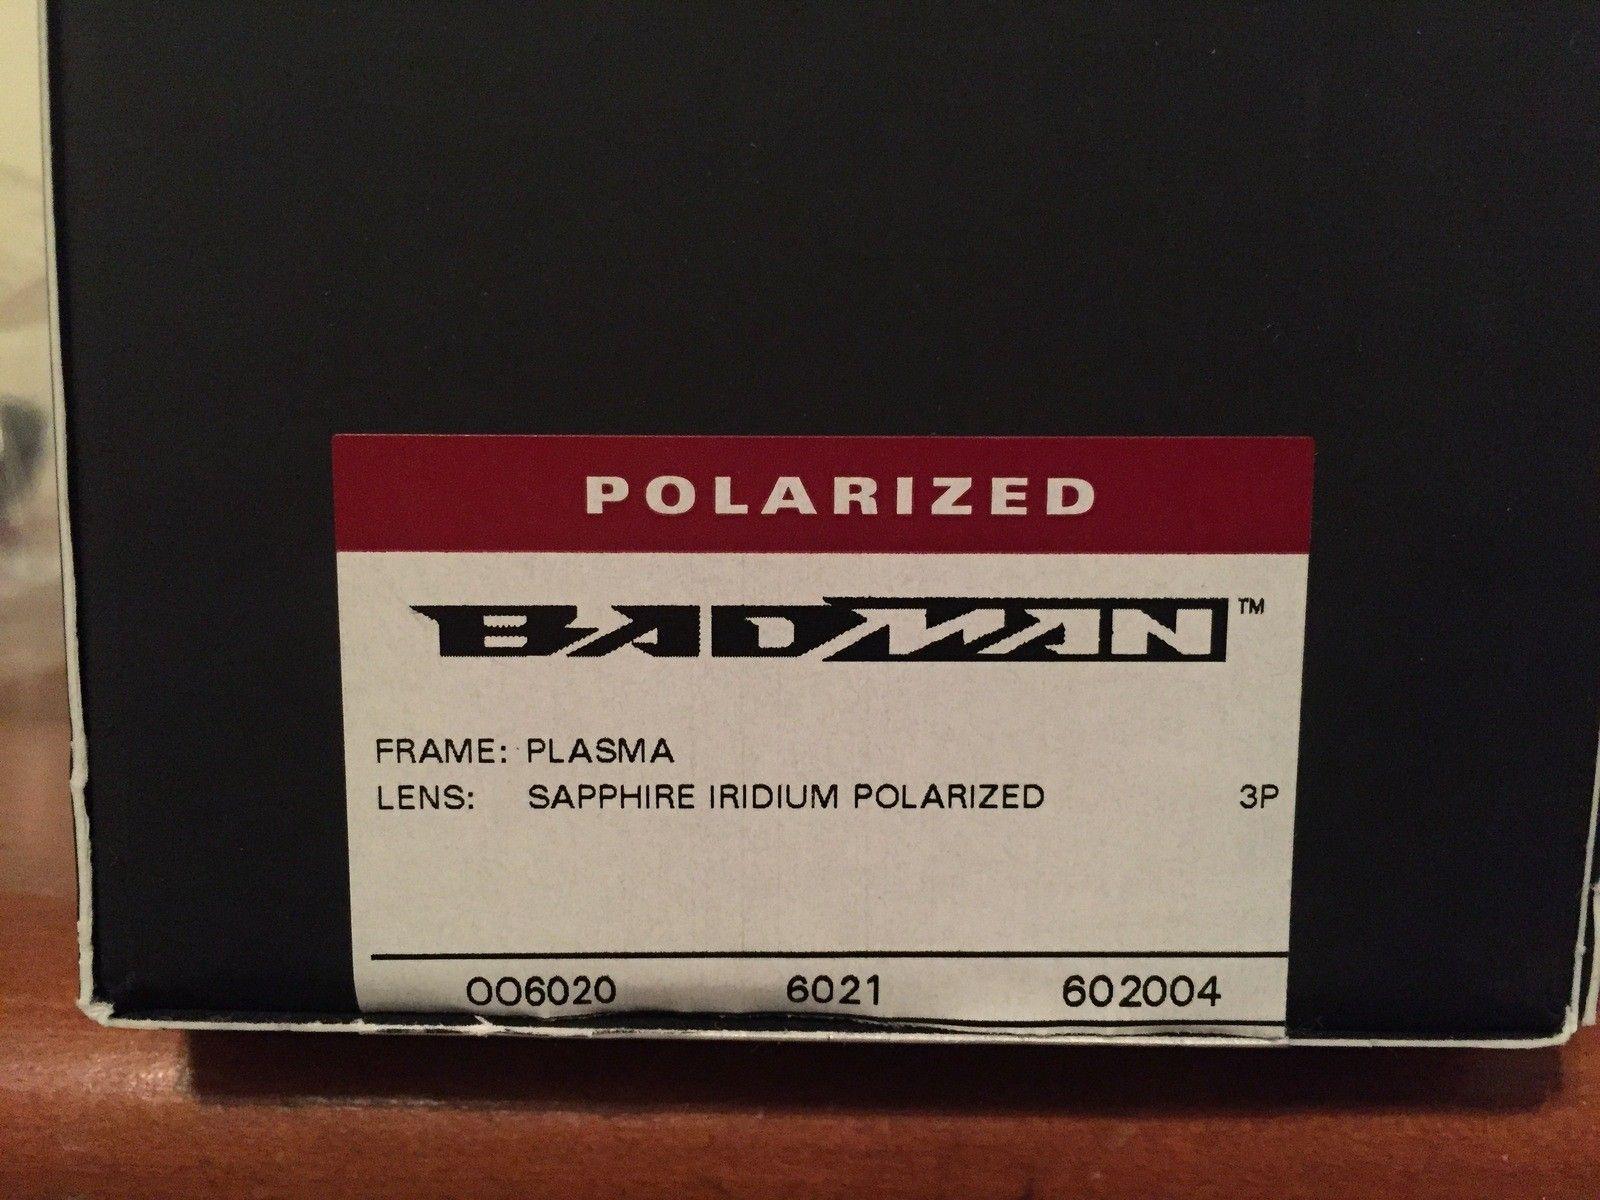 NEW Oakley Badman Sapphire Irid Polarized - IMG_6560.JPG